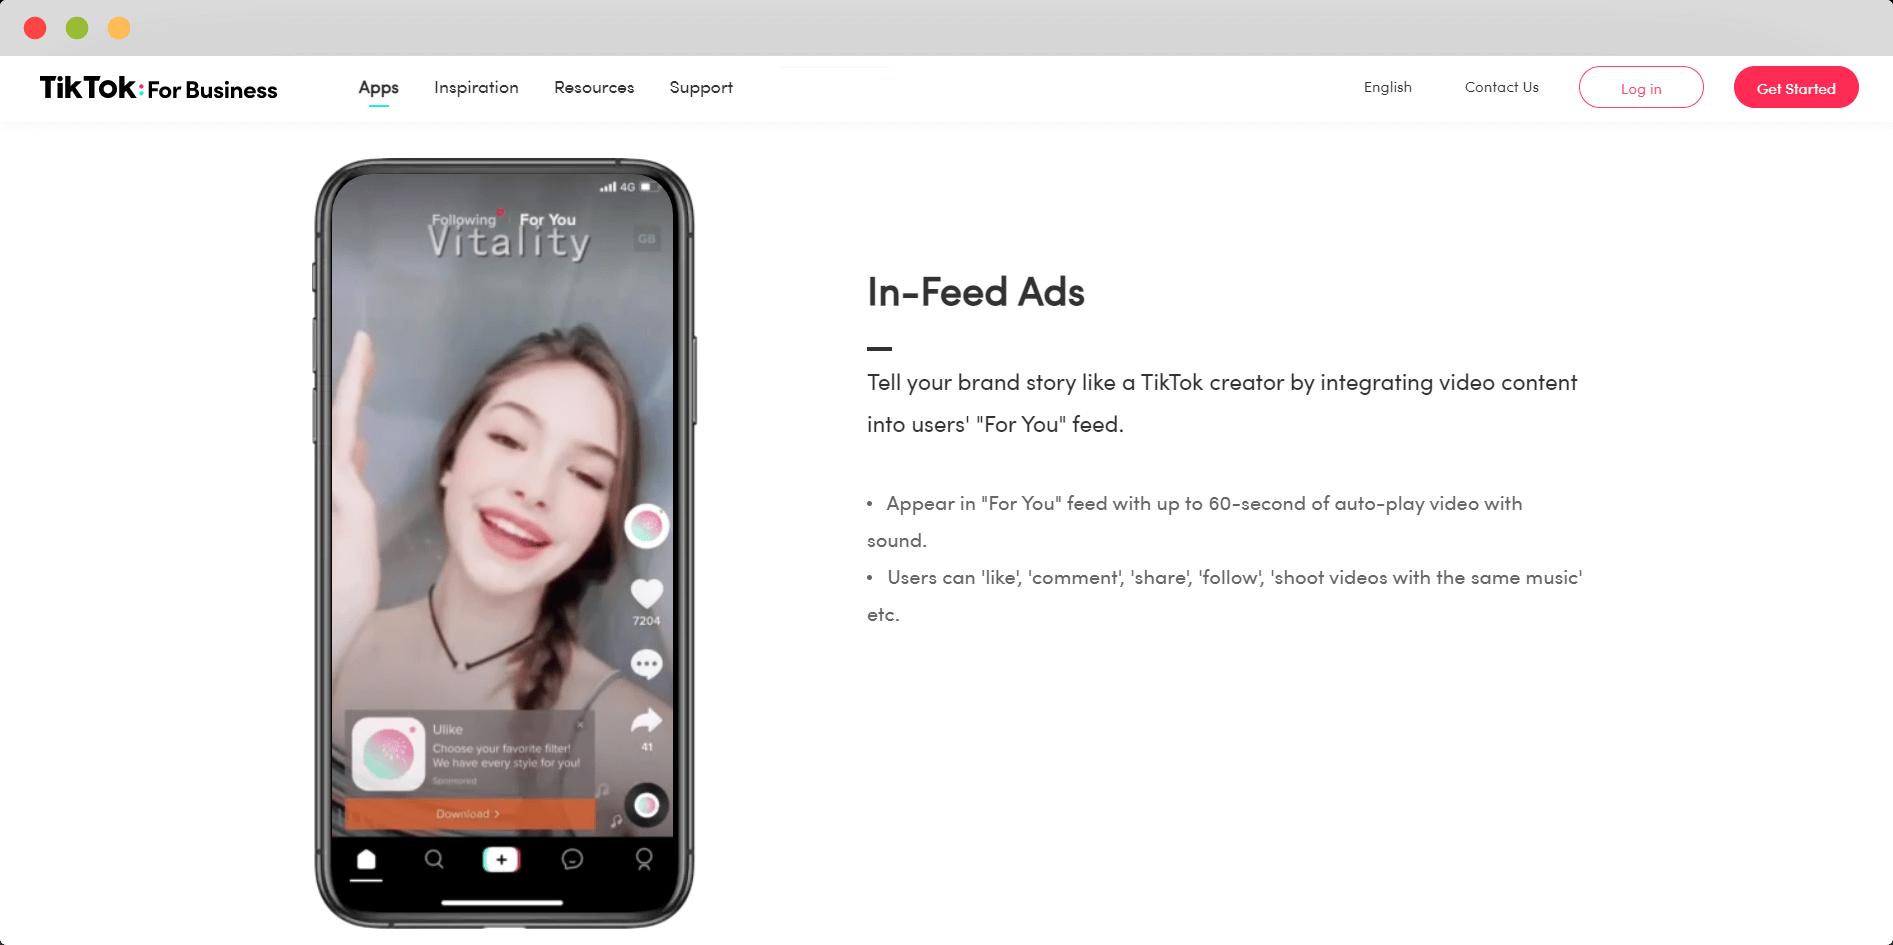 TikTok In-Feed Ads